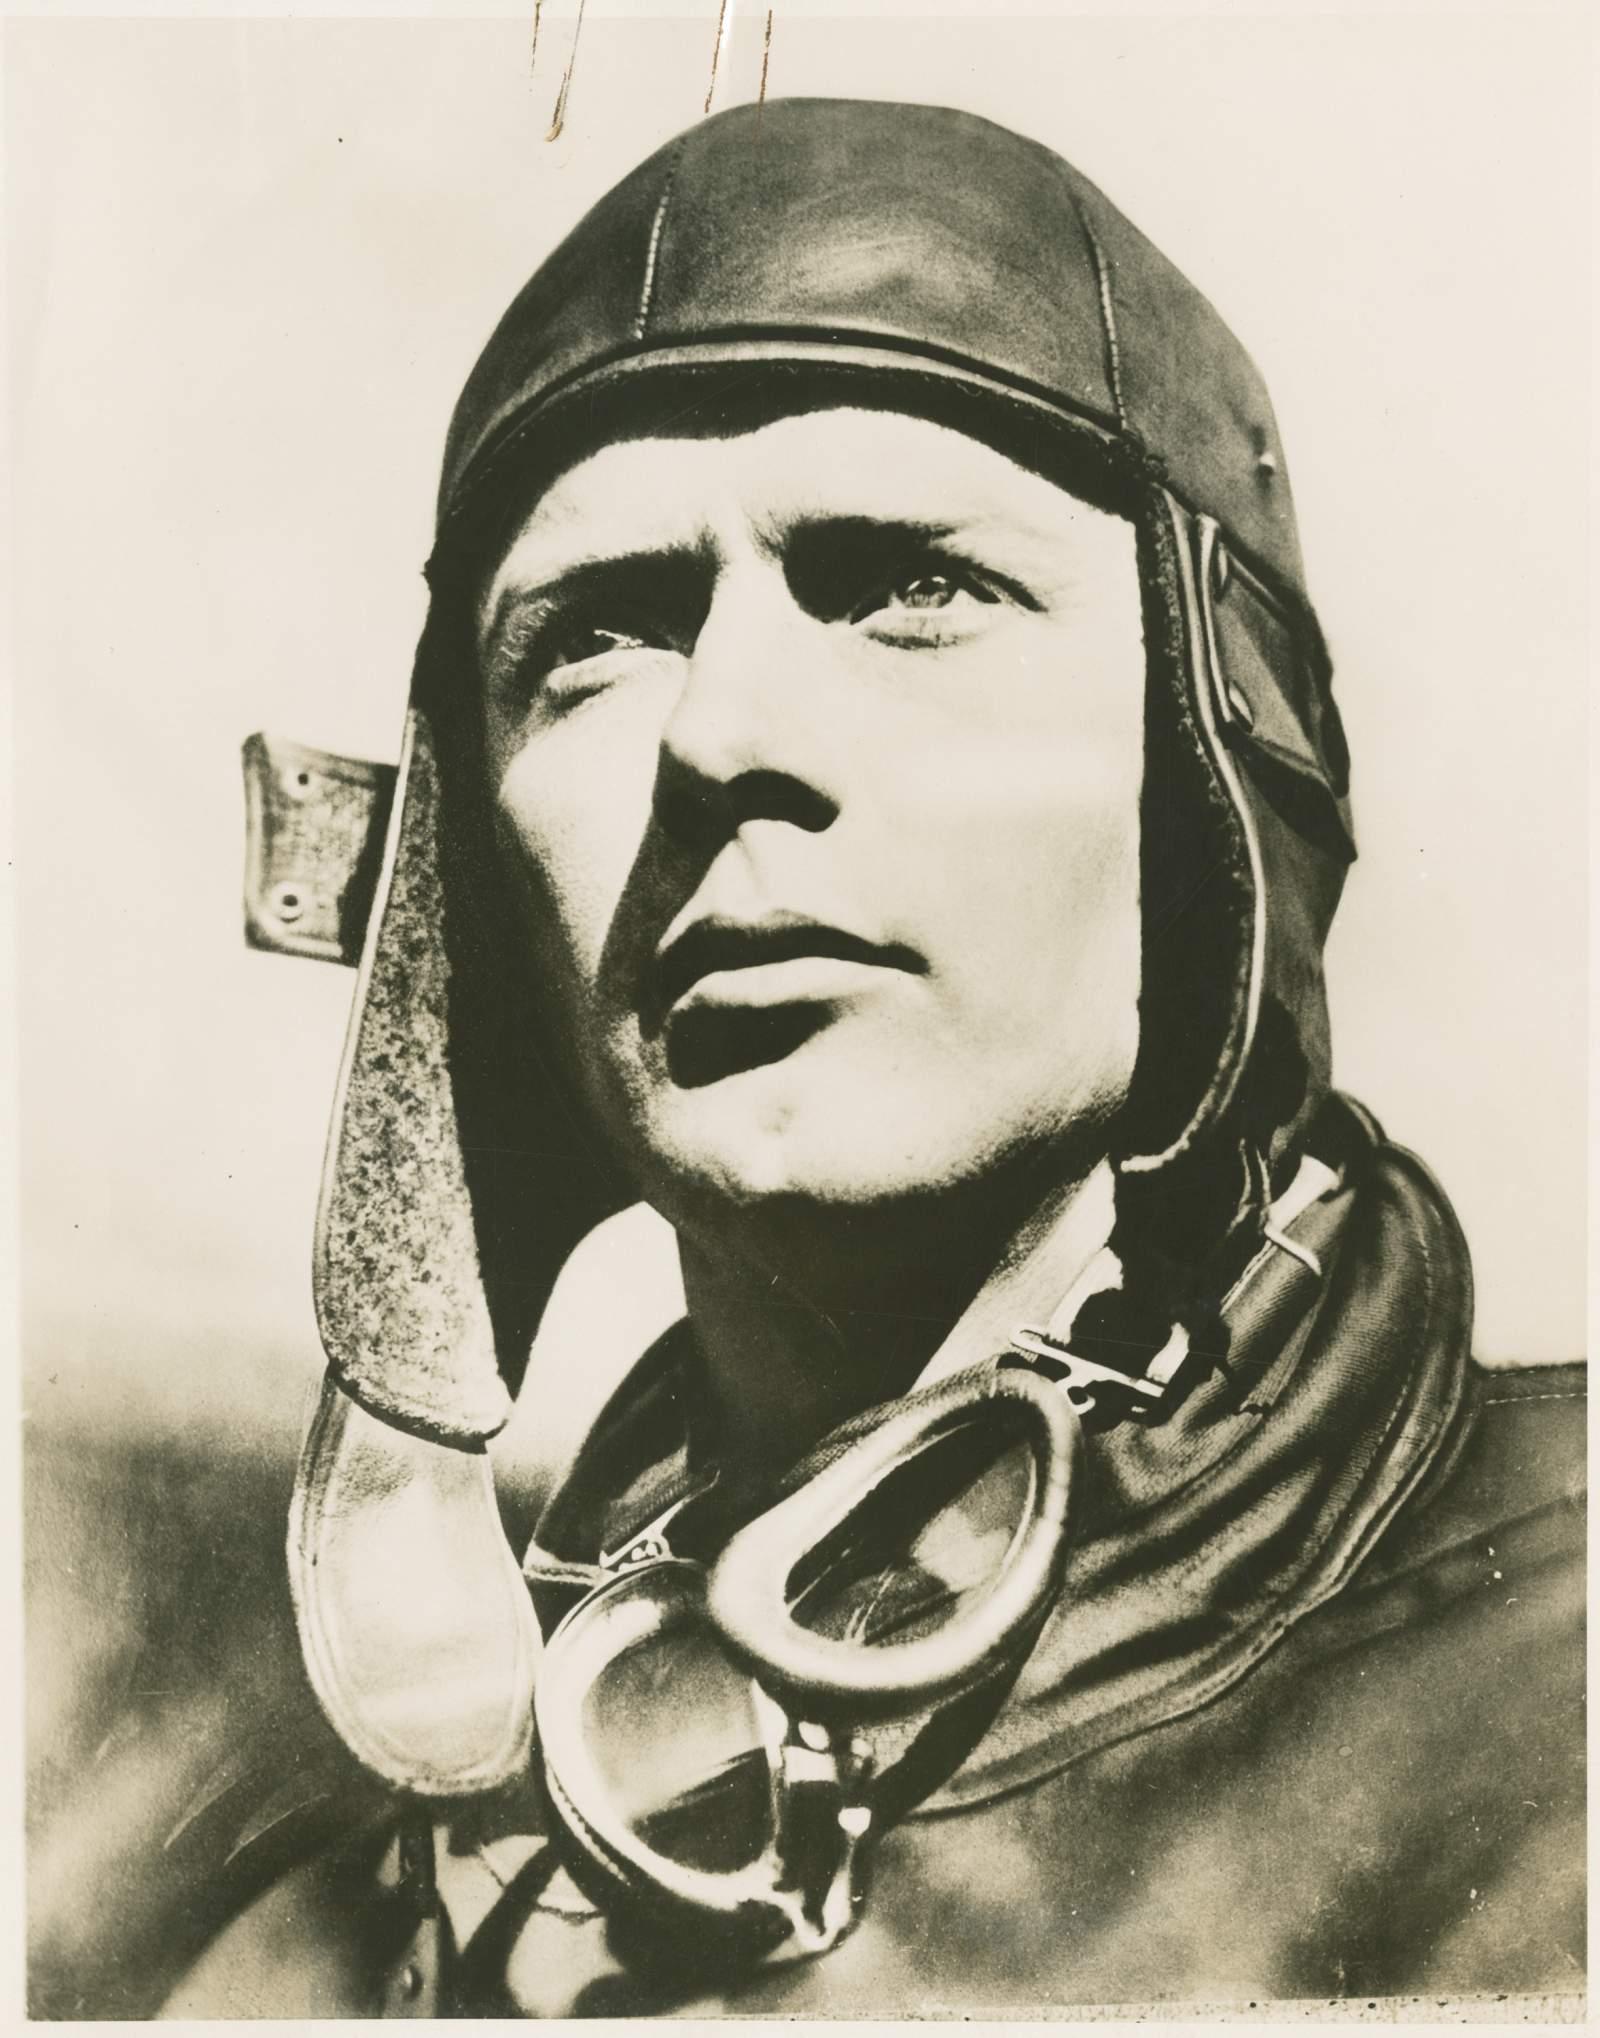 Charles Lindbergh portrait